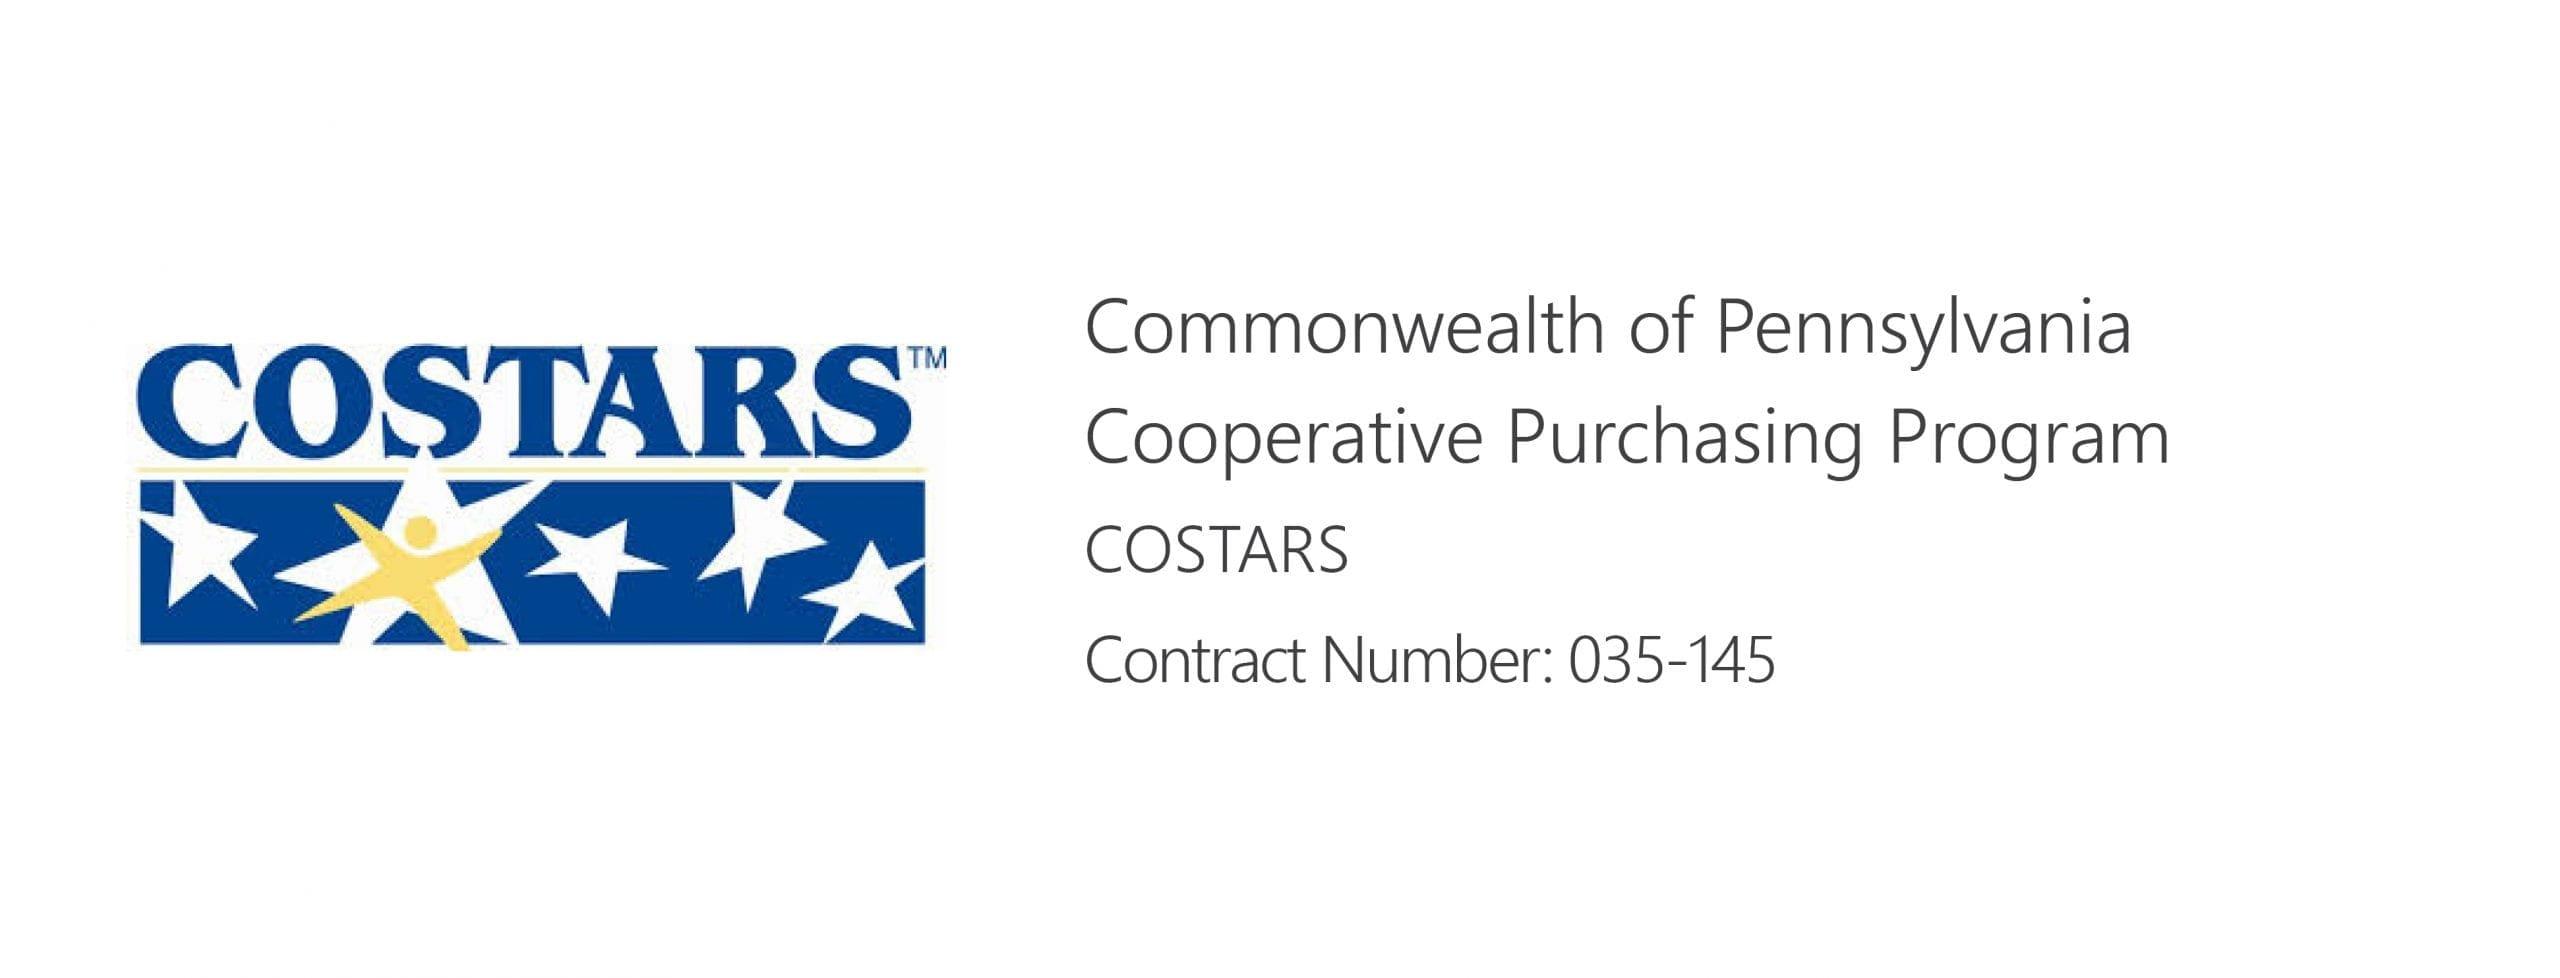 Russ Bassett console furniture available on COSTARS-PA